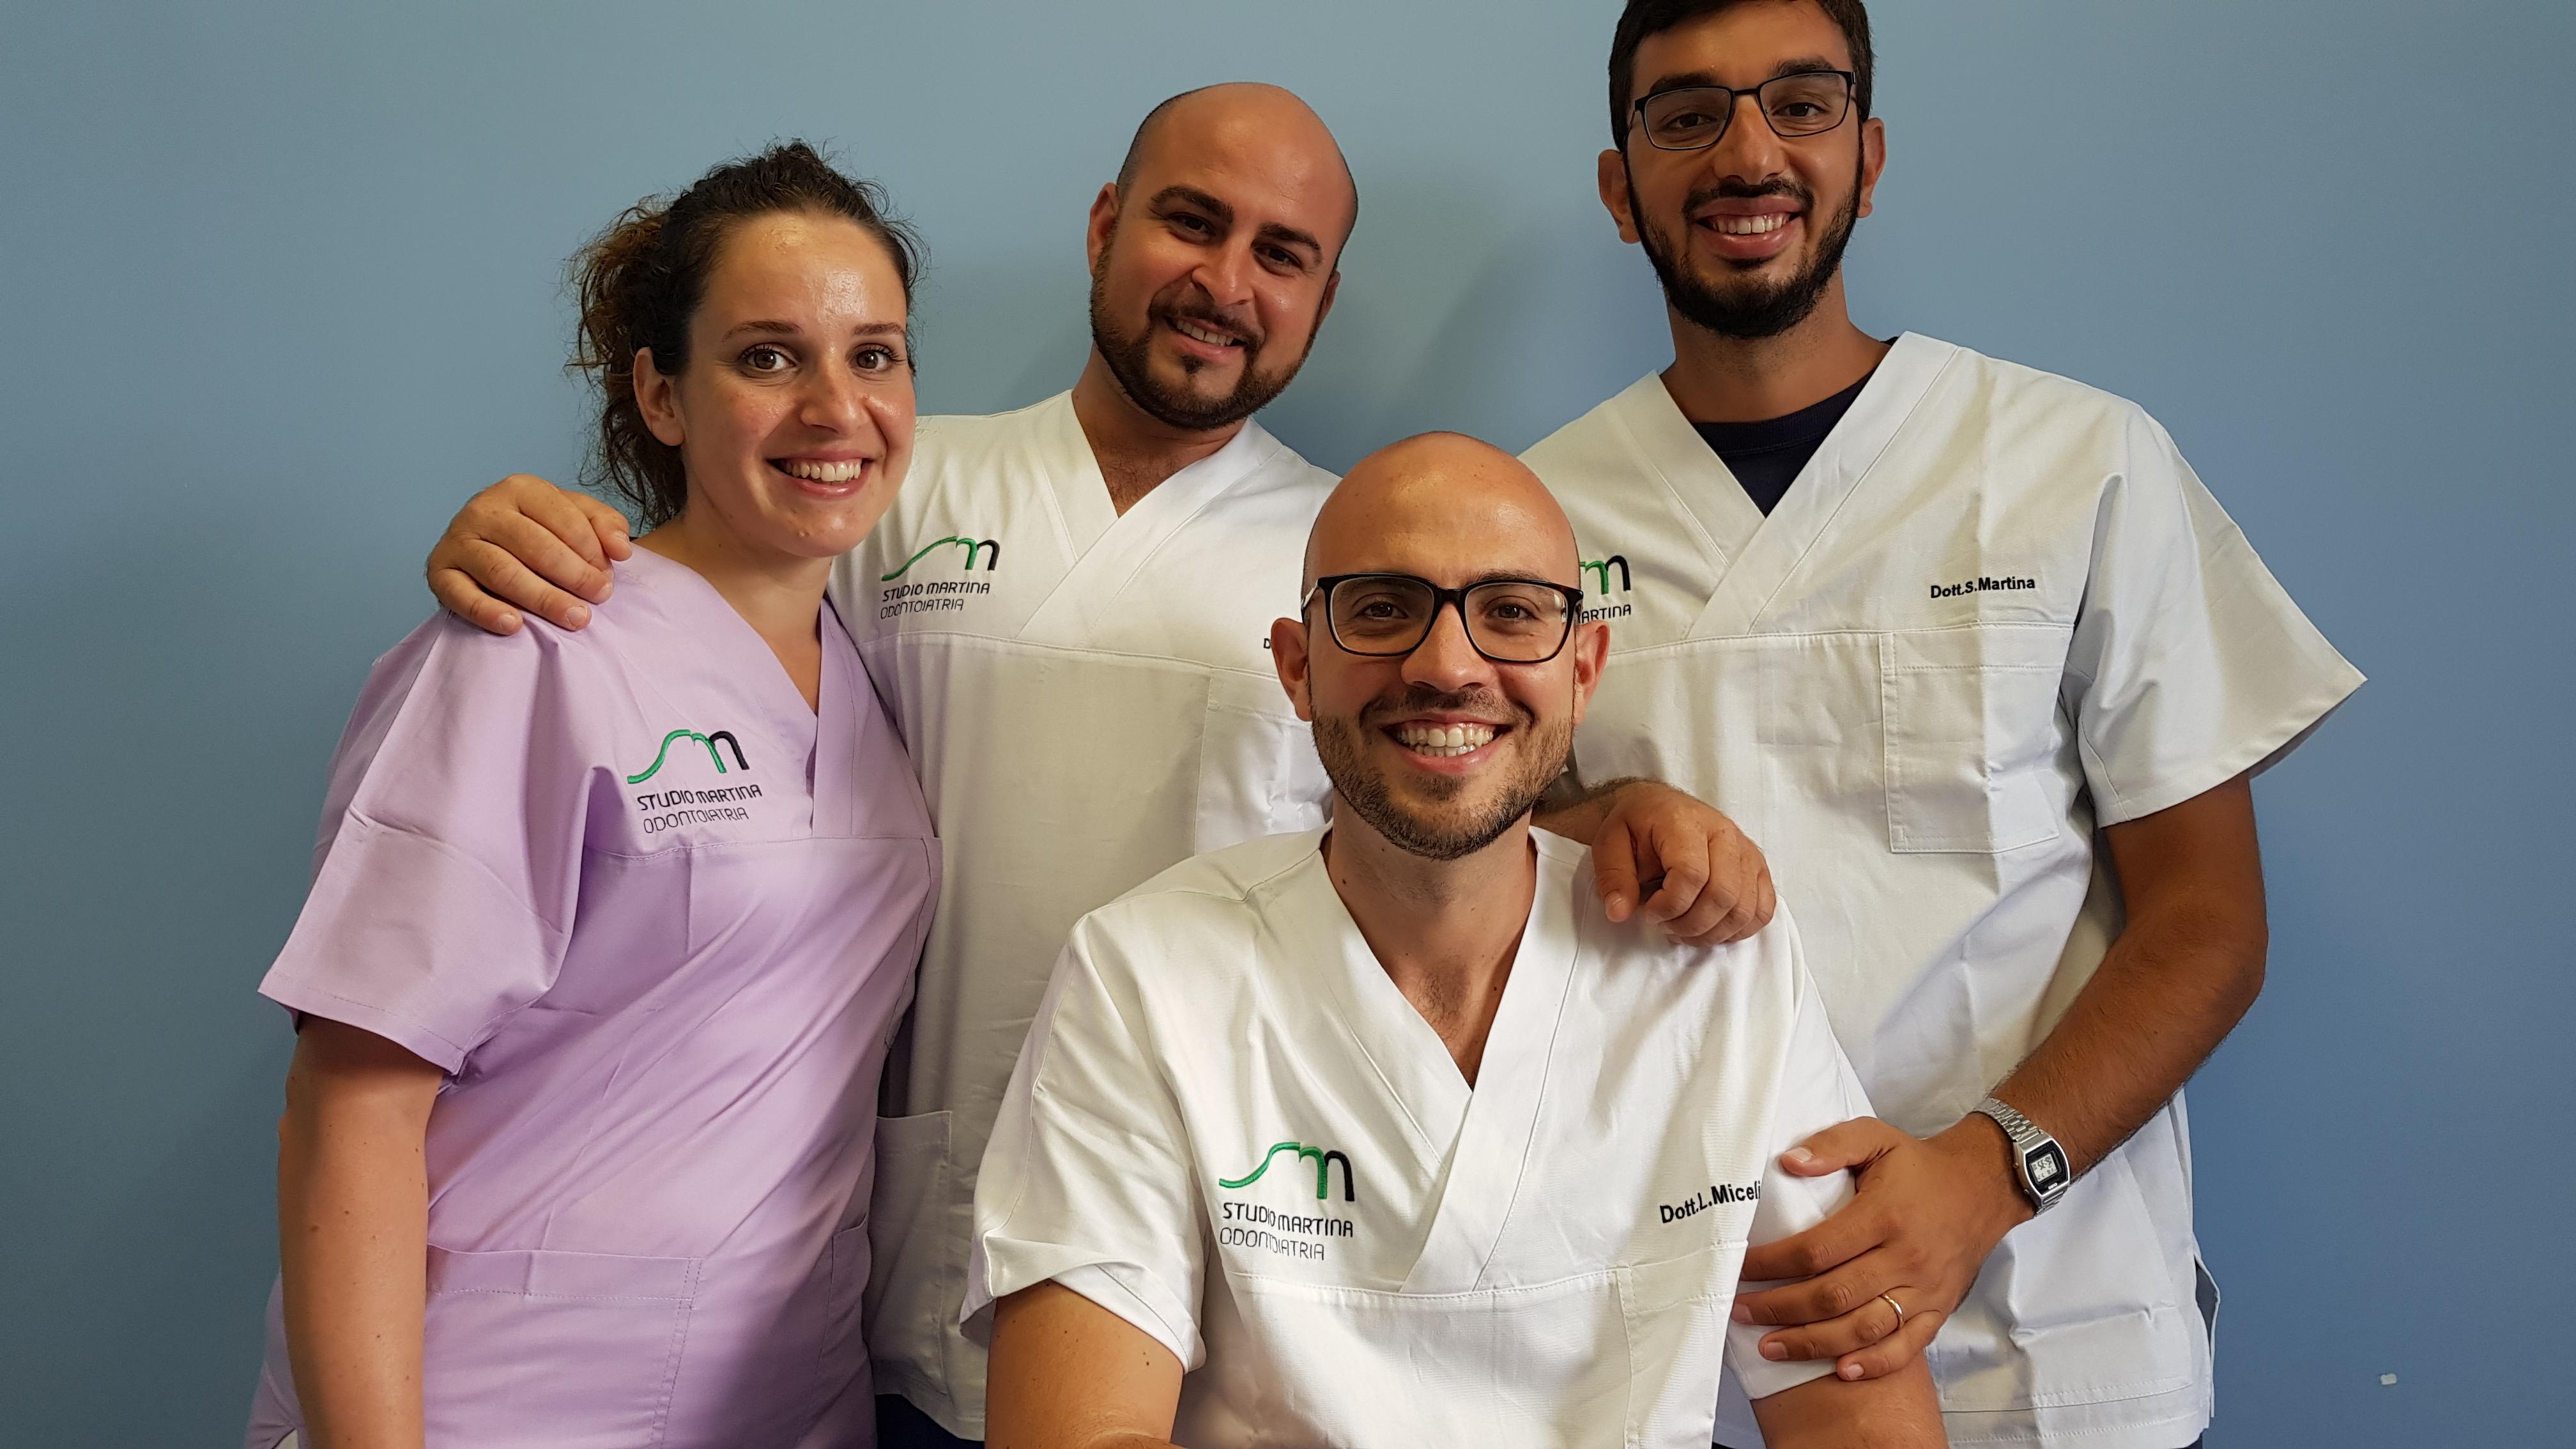 team studio martina odontoiatria